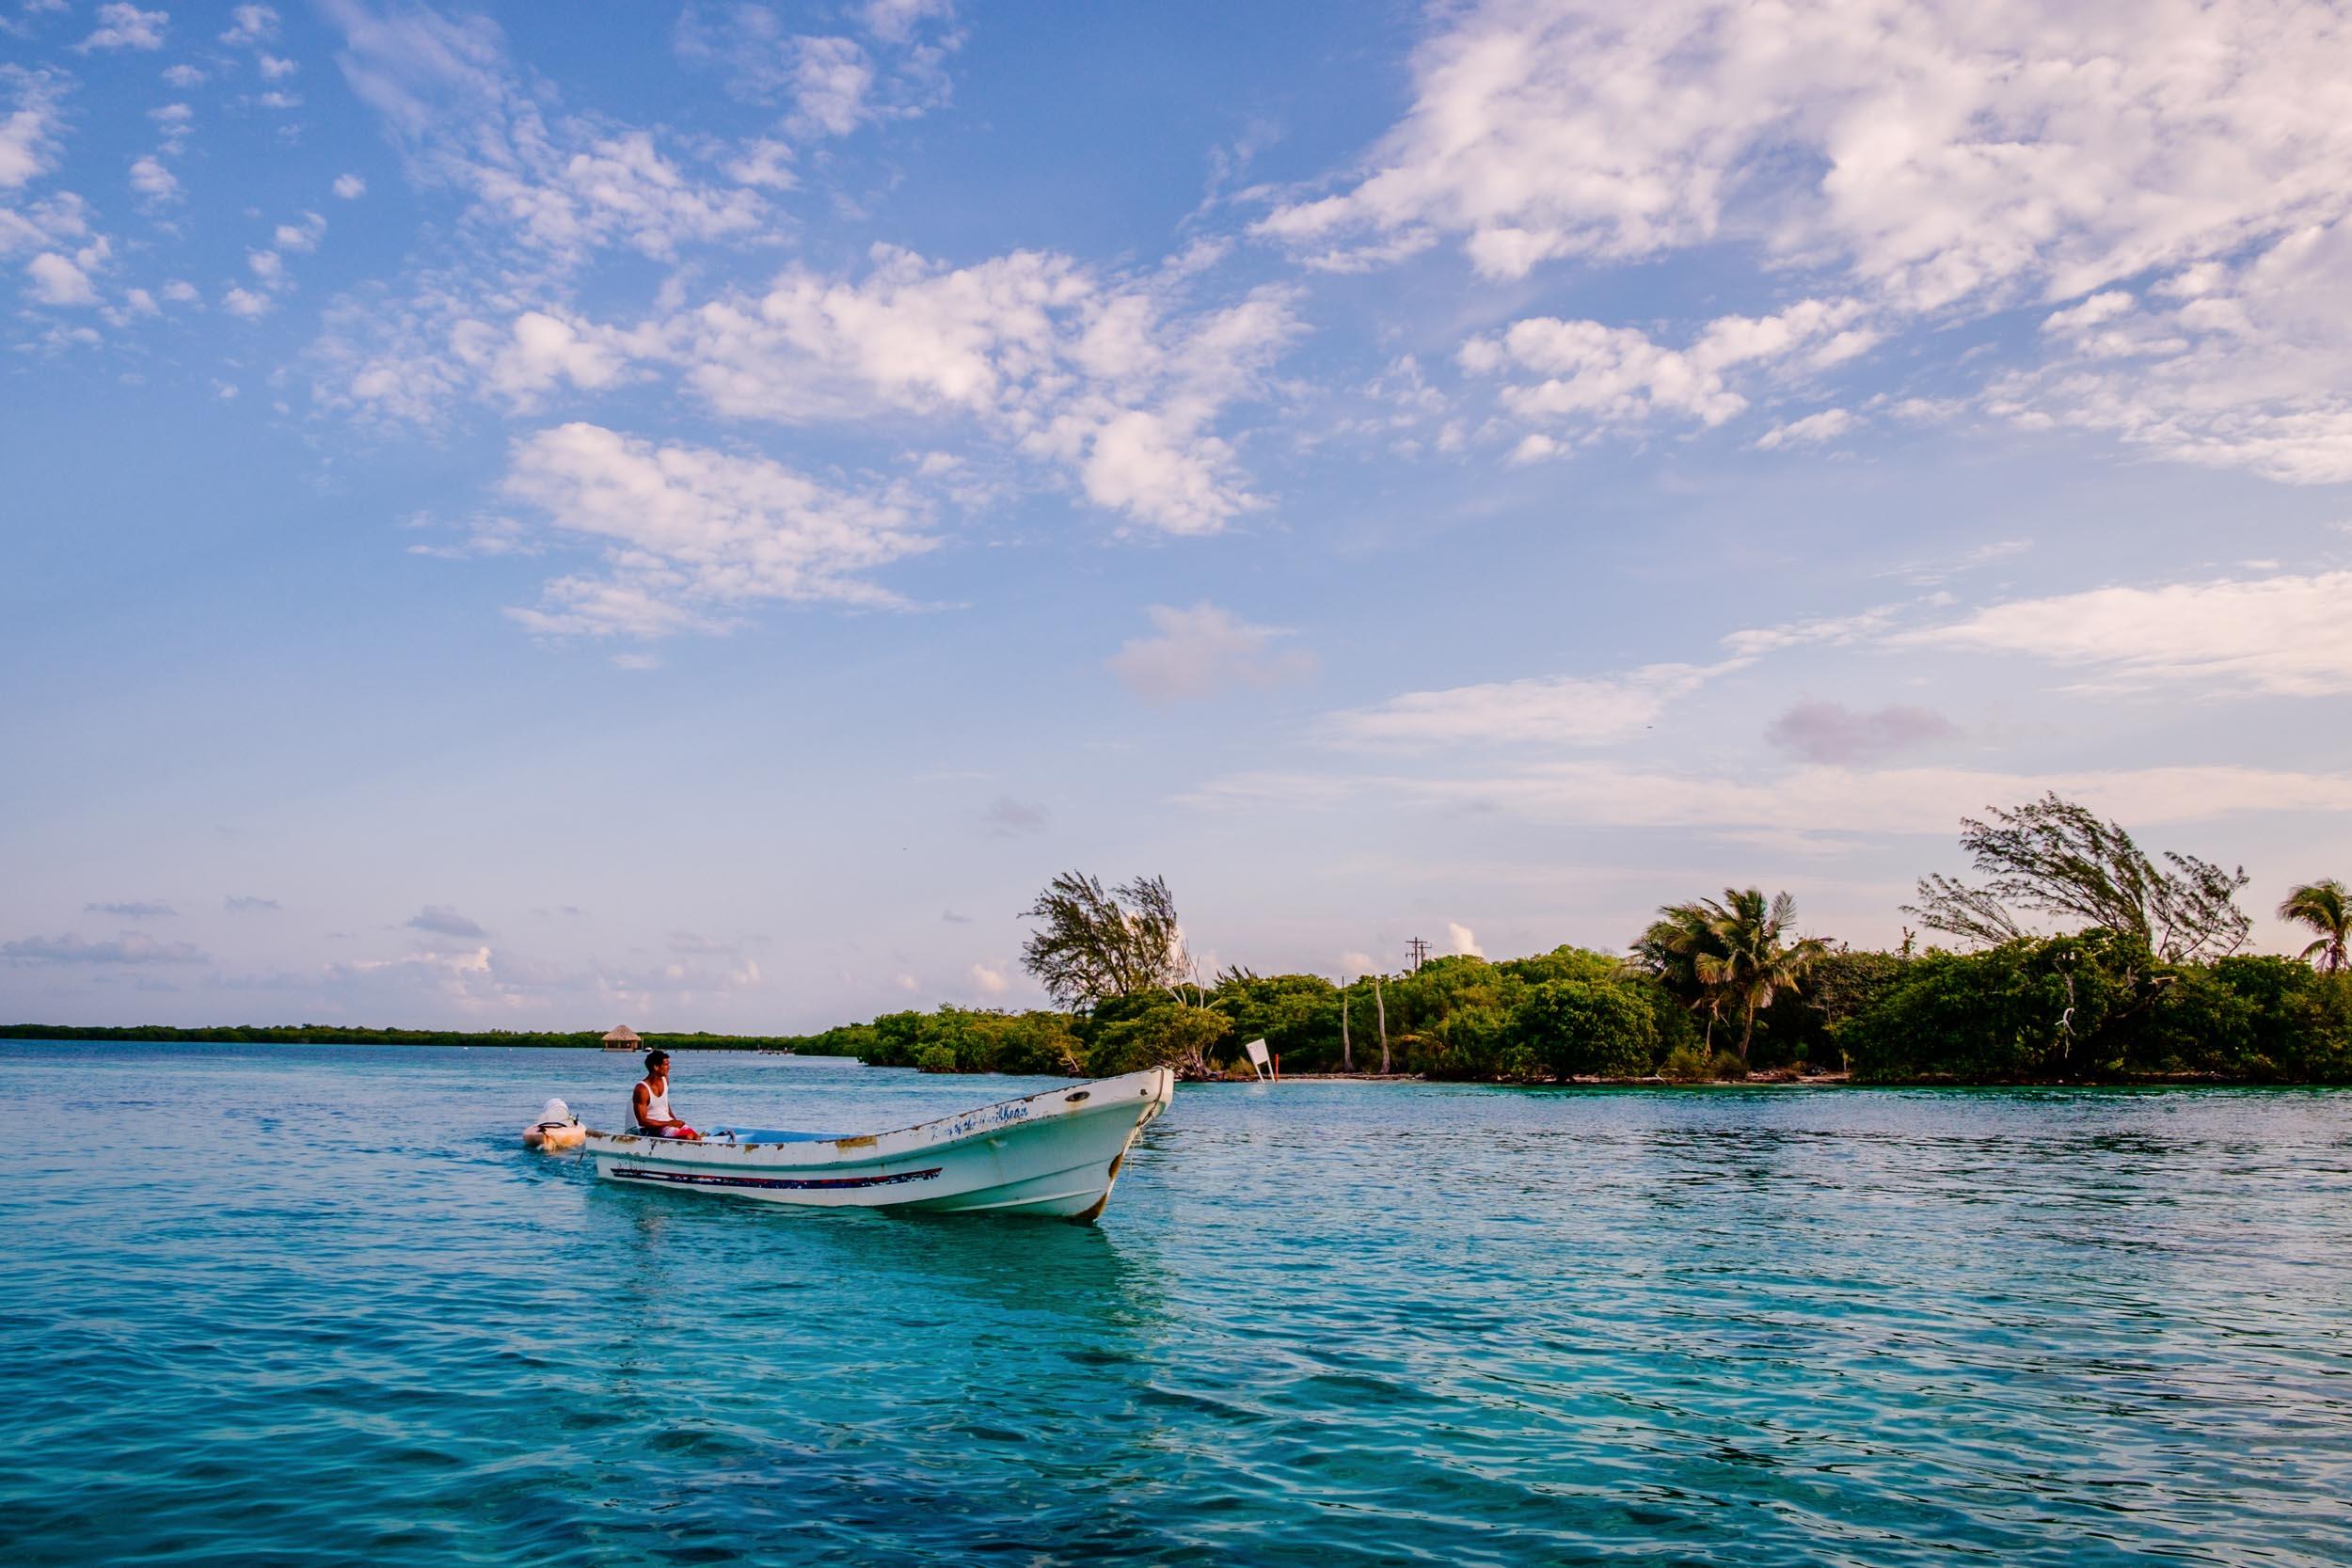 Boat on Caribbean Sea